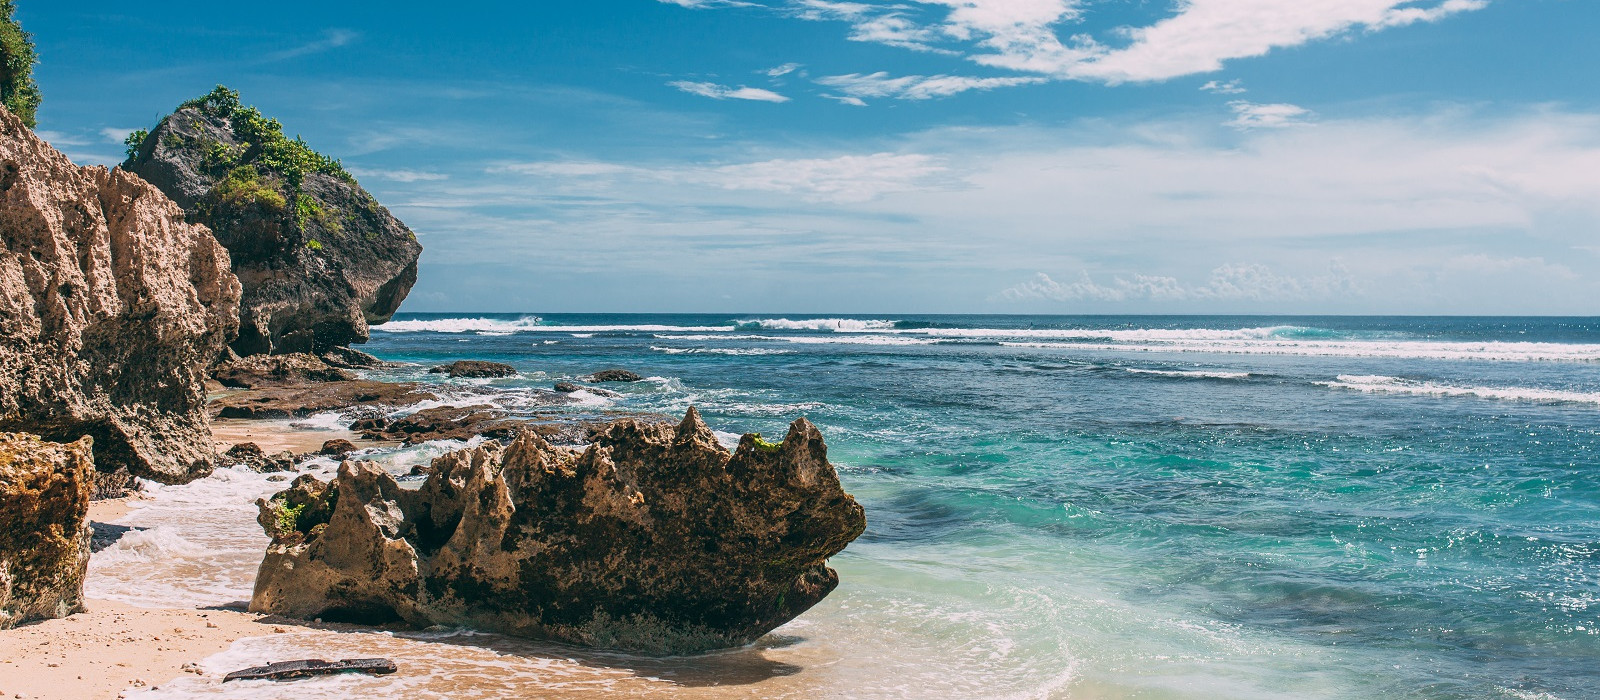 Bali's Culture and Coast Tour Trip 1